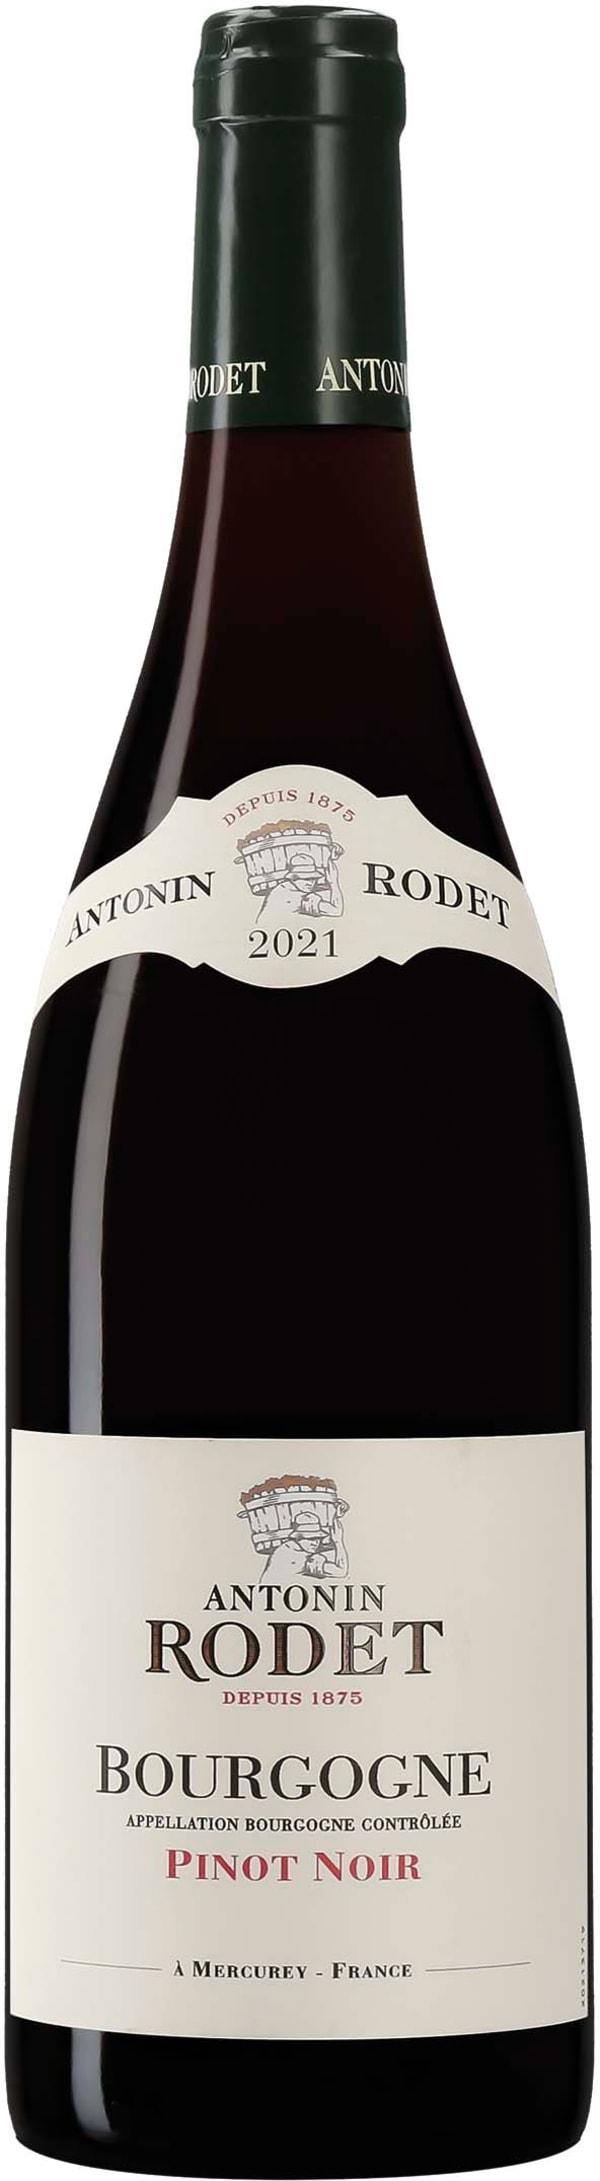 Antonin Rodet Pinot Noir 2016